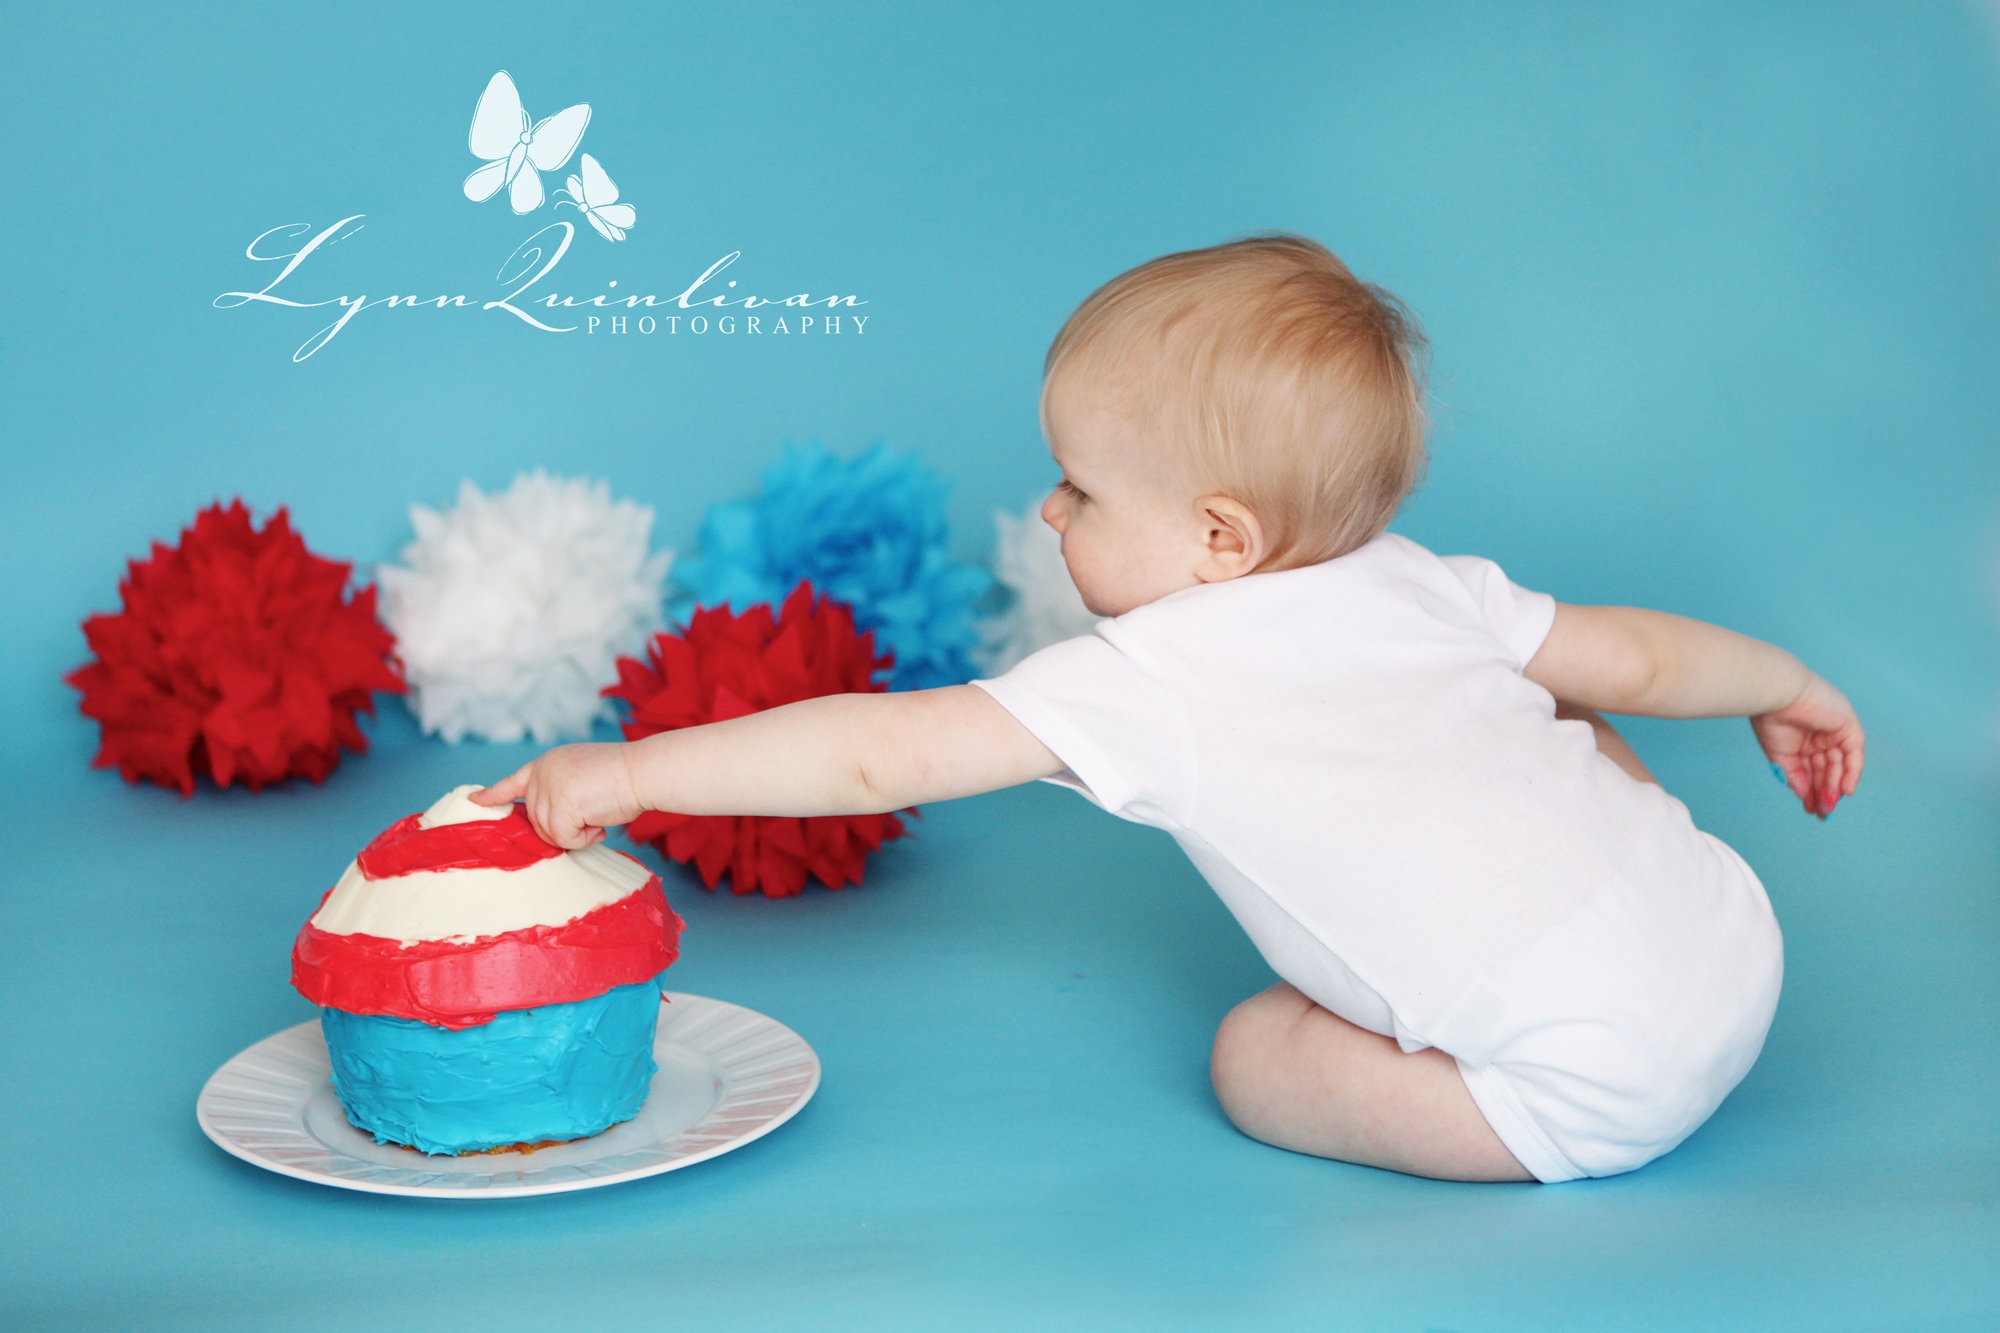 Massachusetts Baby grapher e Year Old Boy Birthday Cake Dr